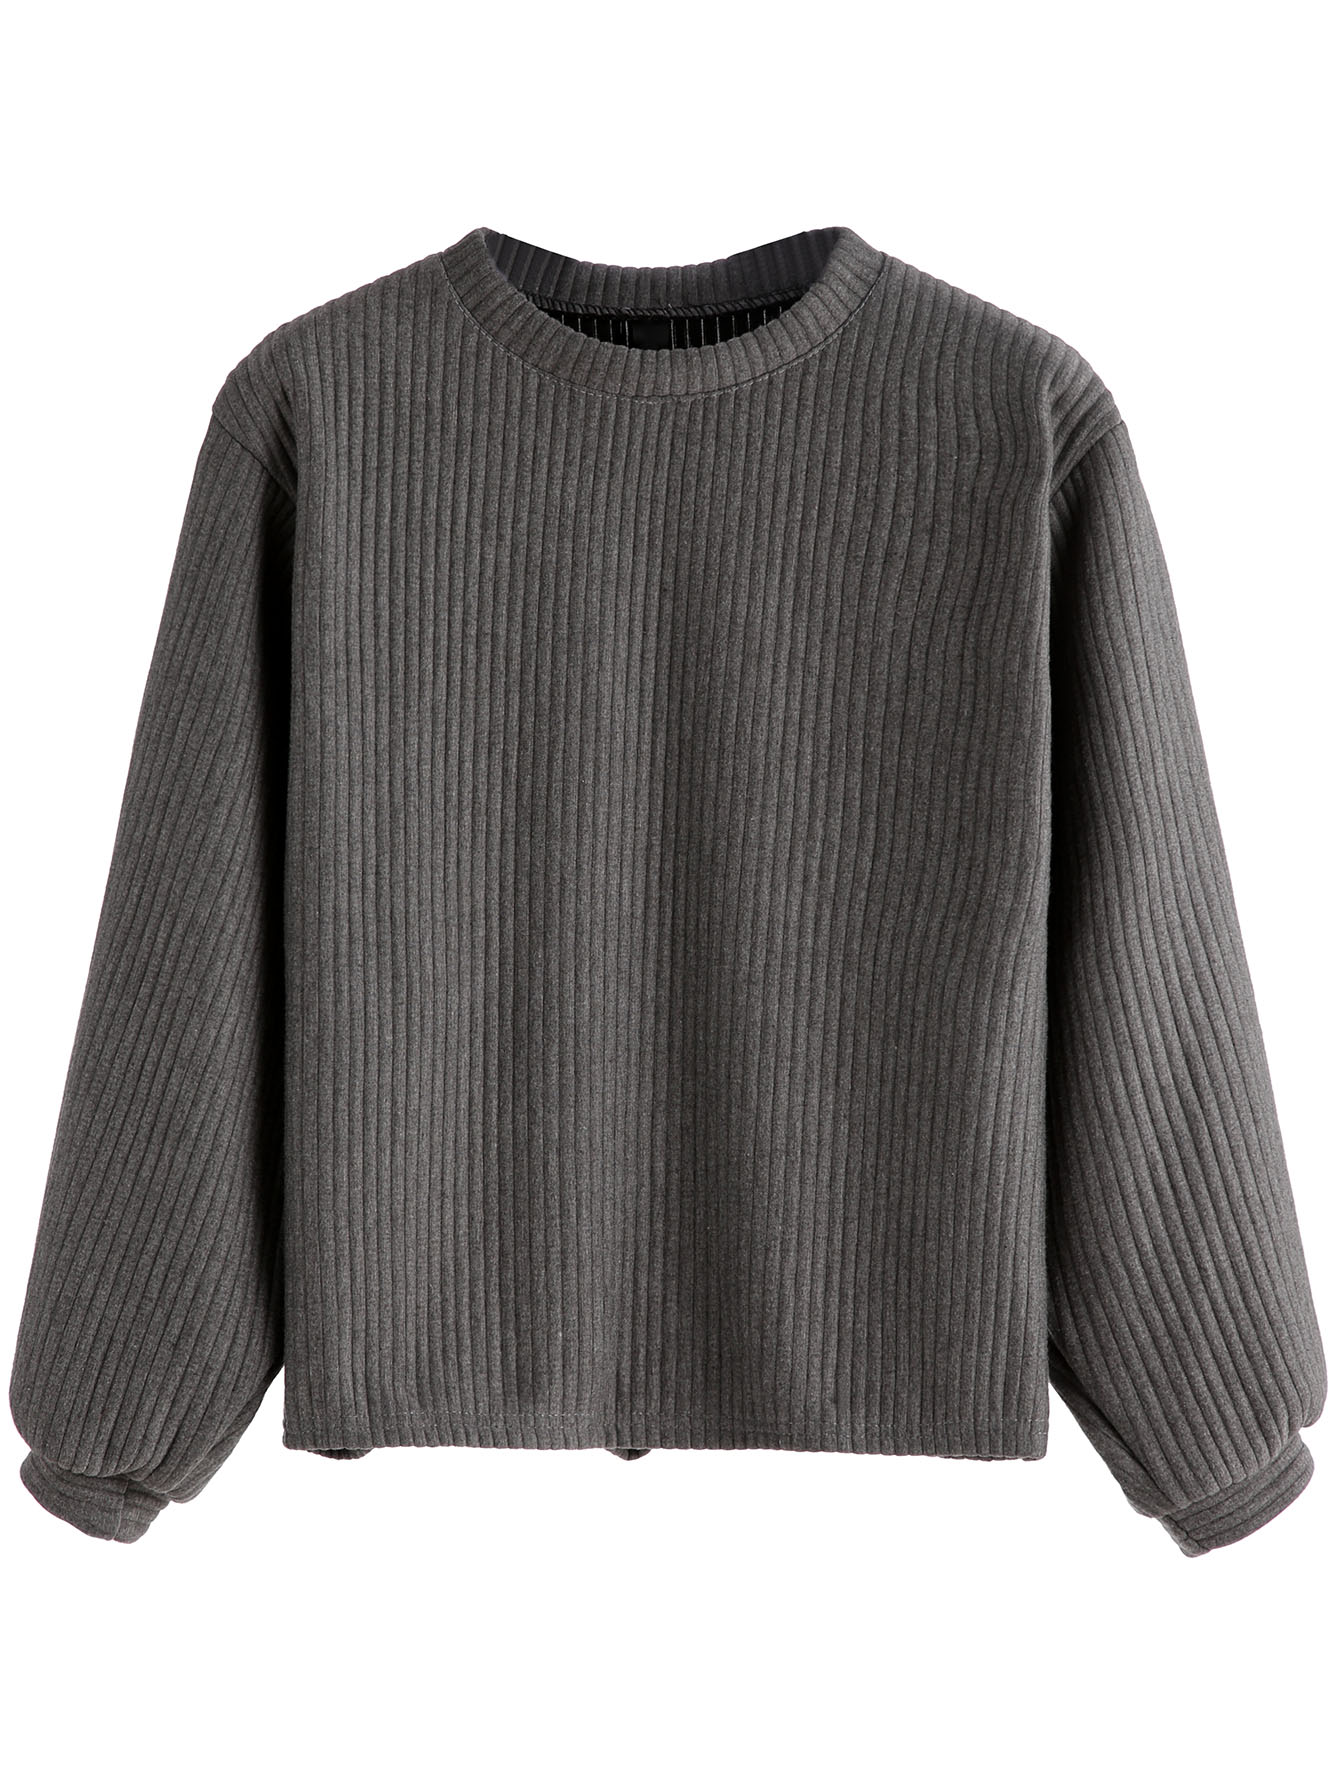 Ribbed Knit Sweatshirt sweatshirt160908103